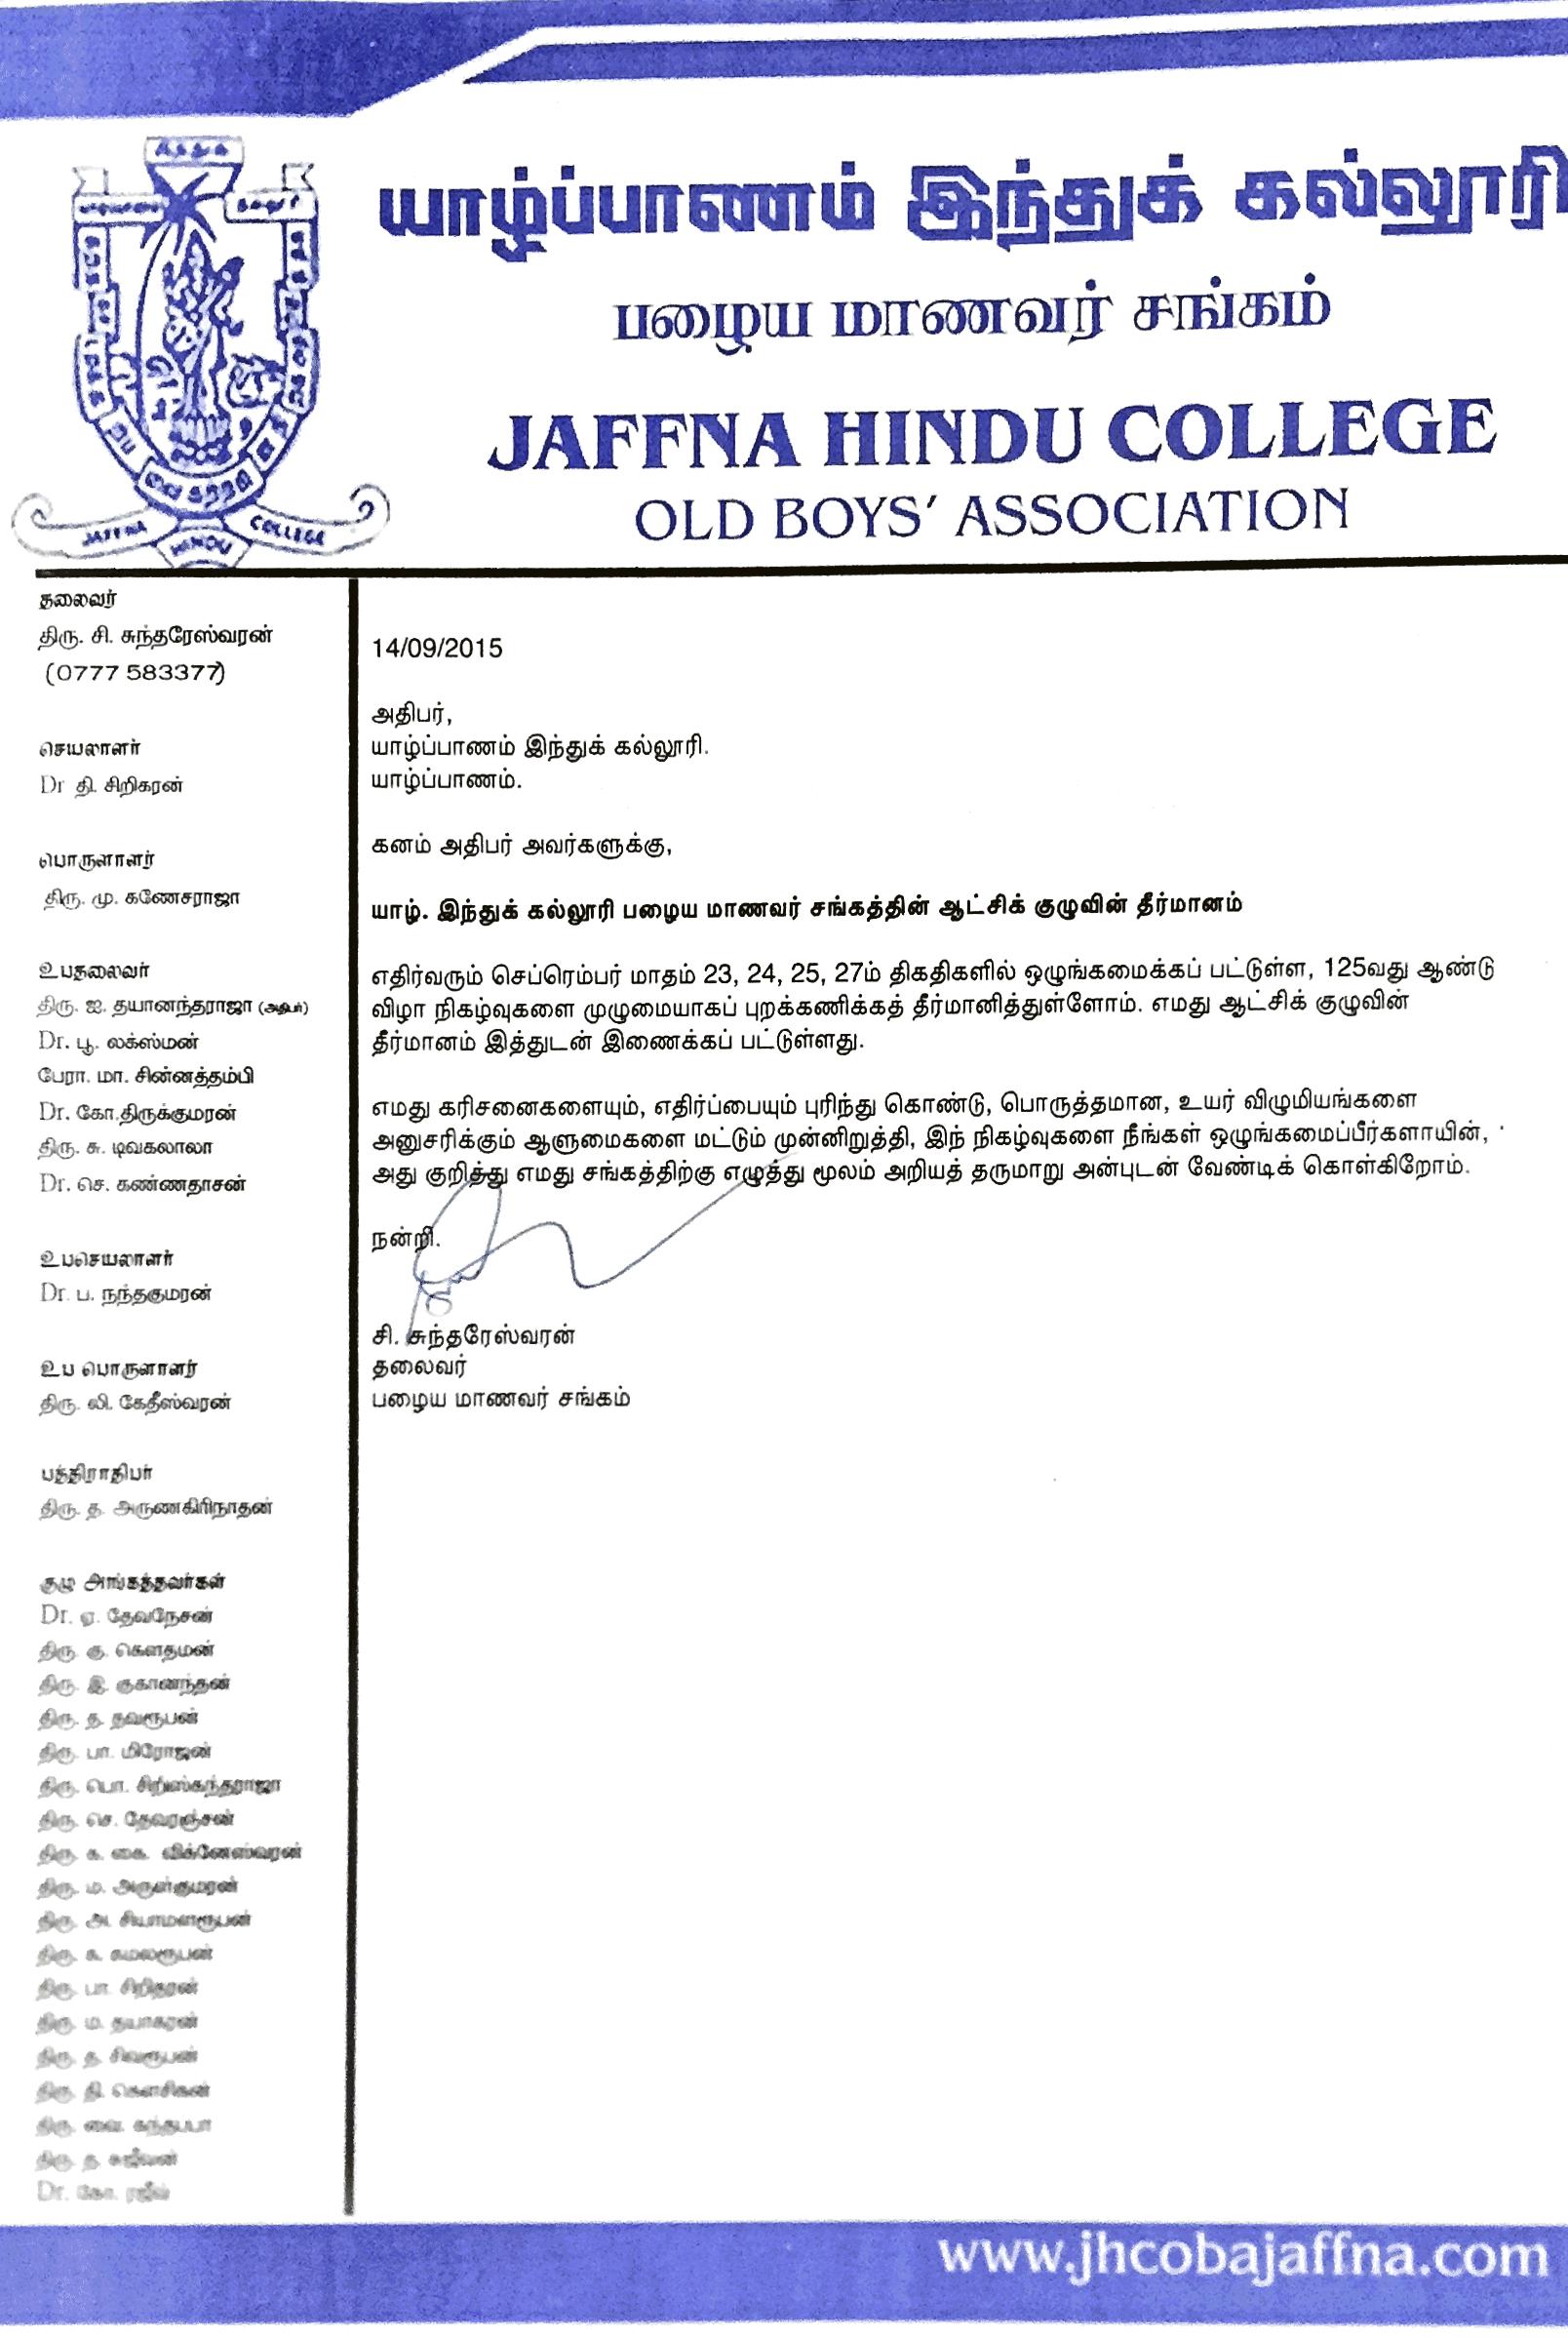 Covering Letter 14092015